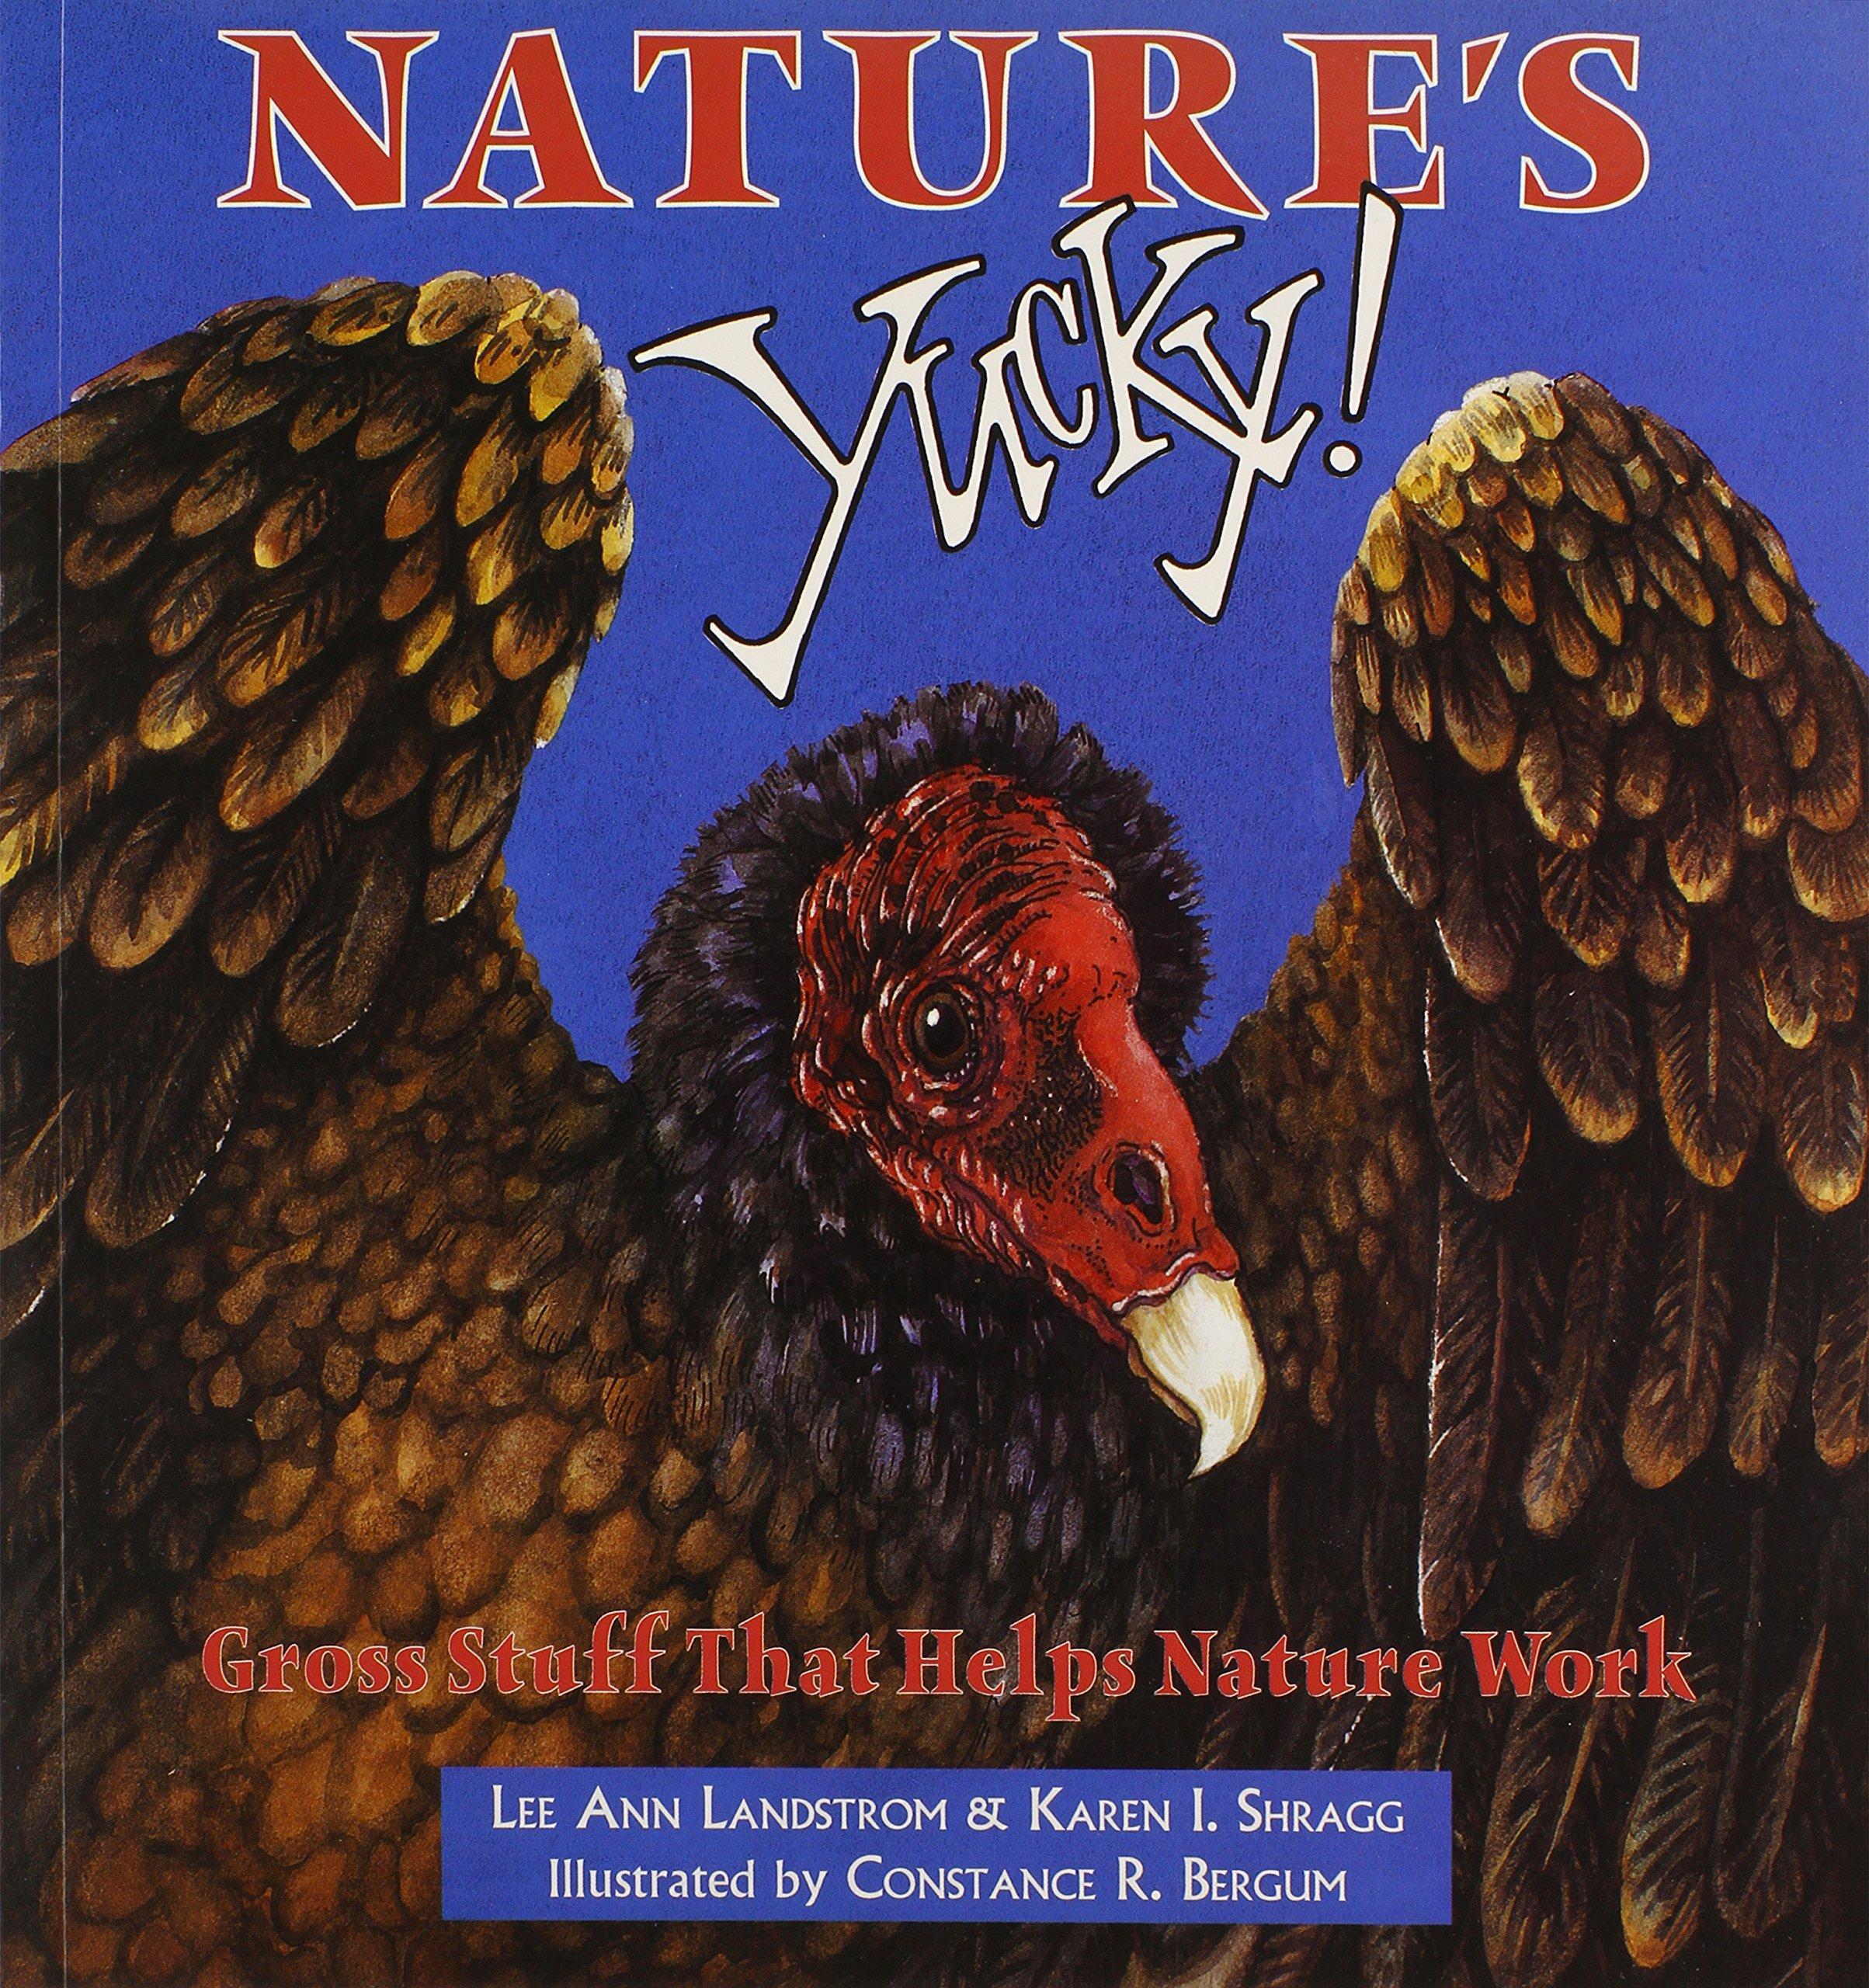 NaturesYucky1.jpg